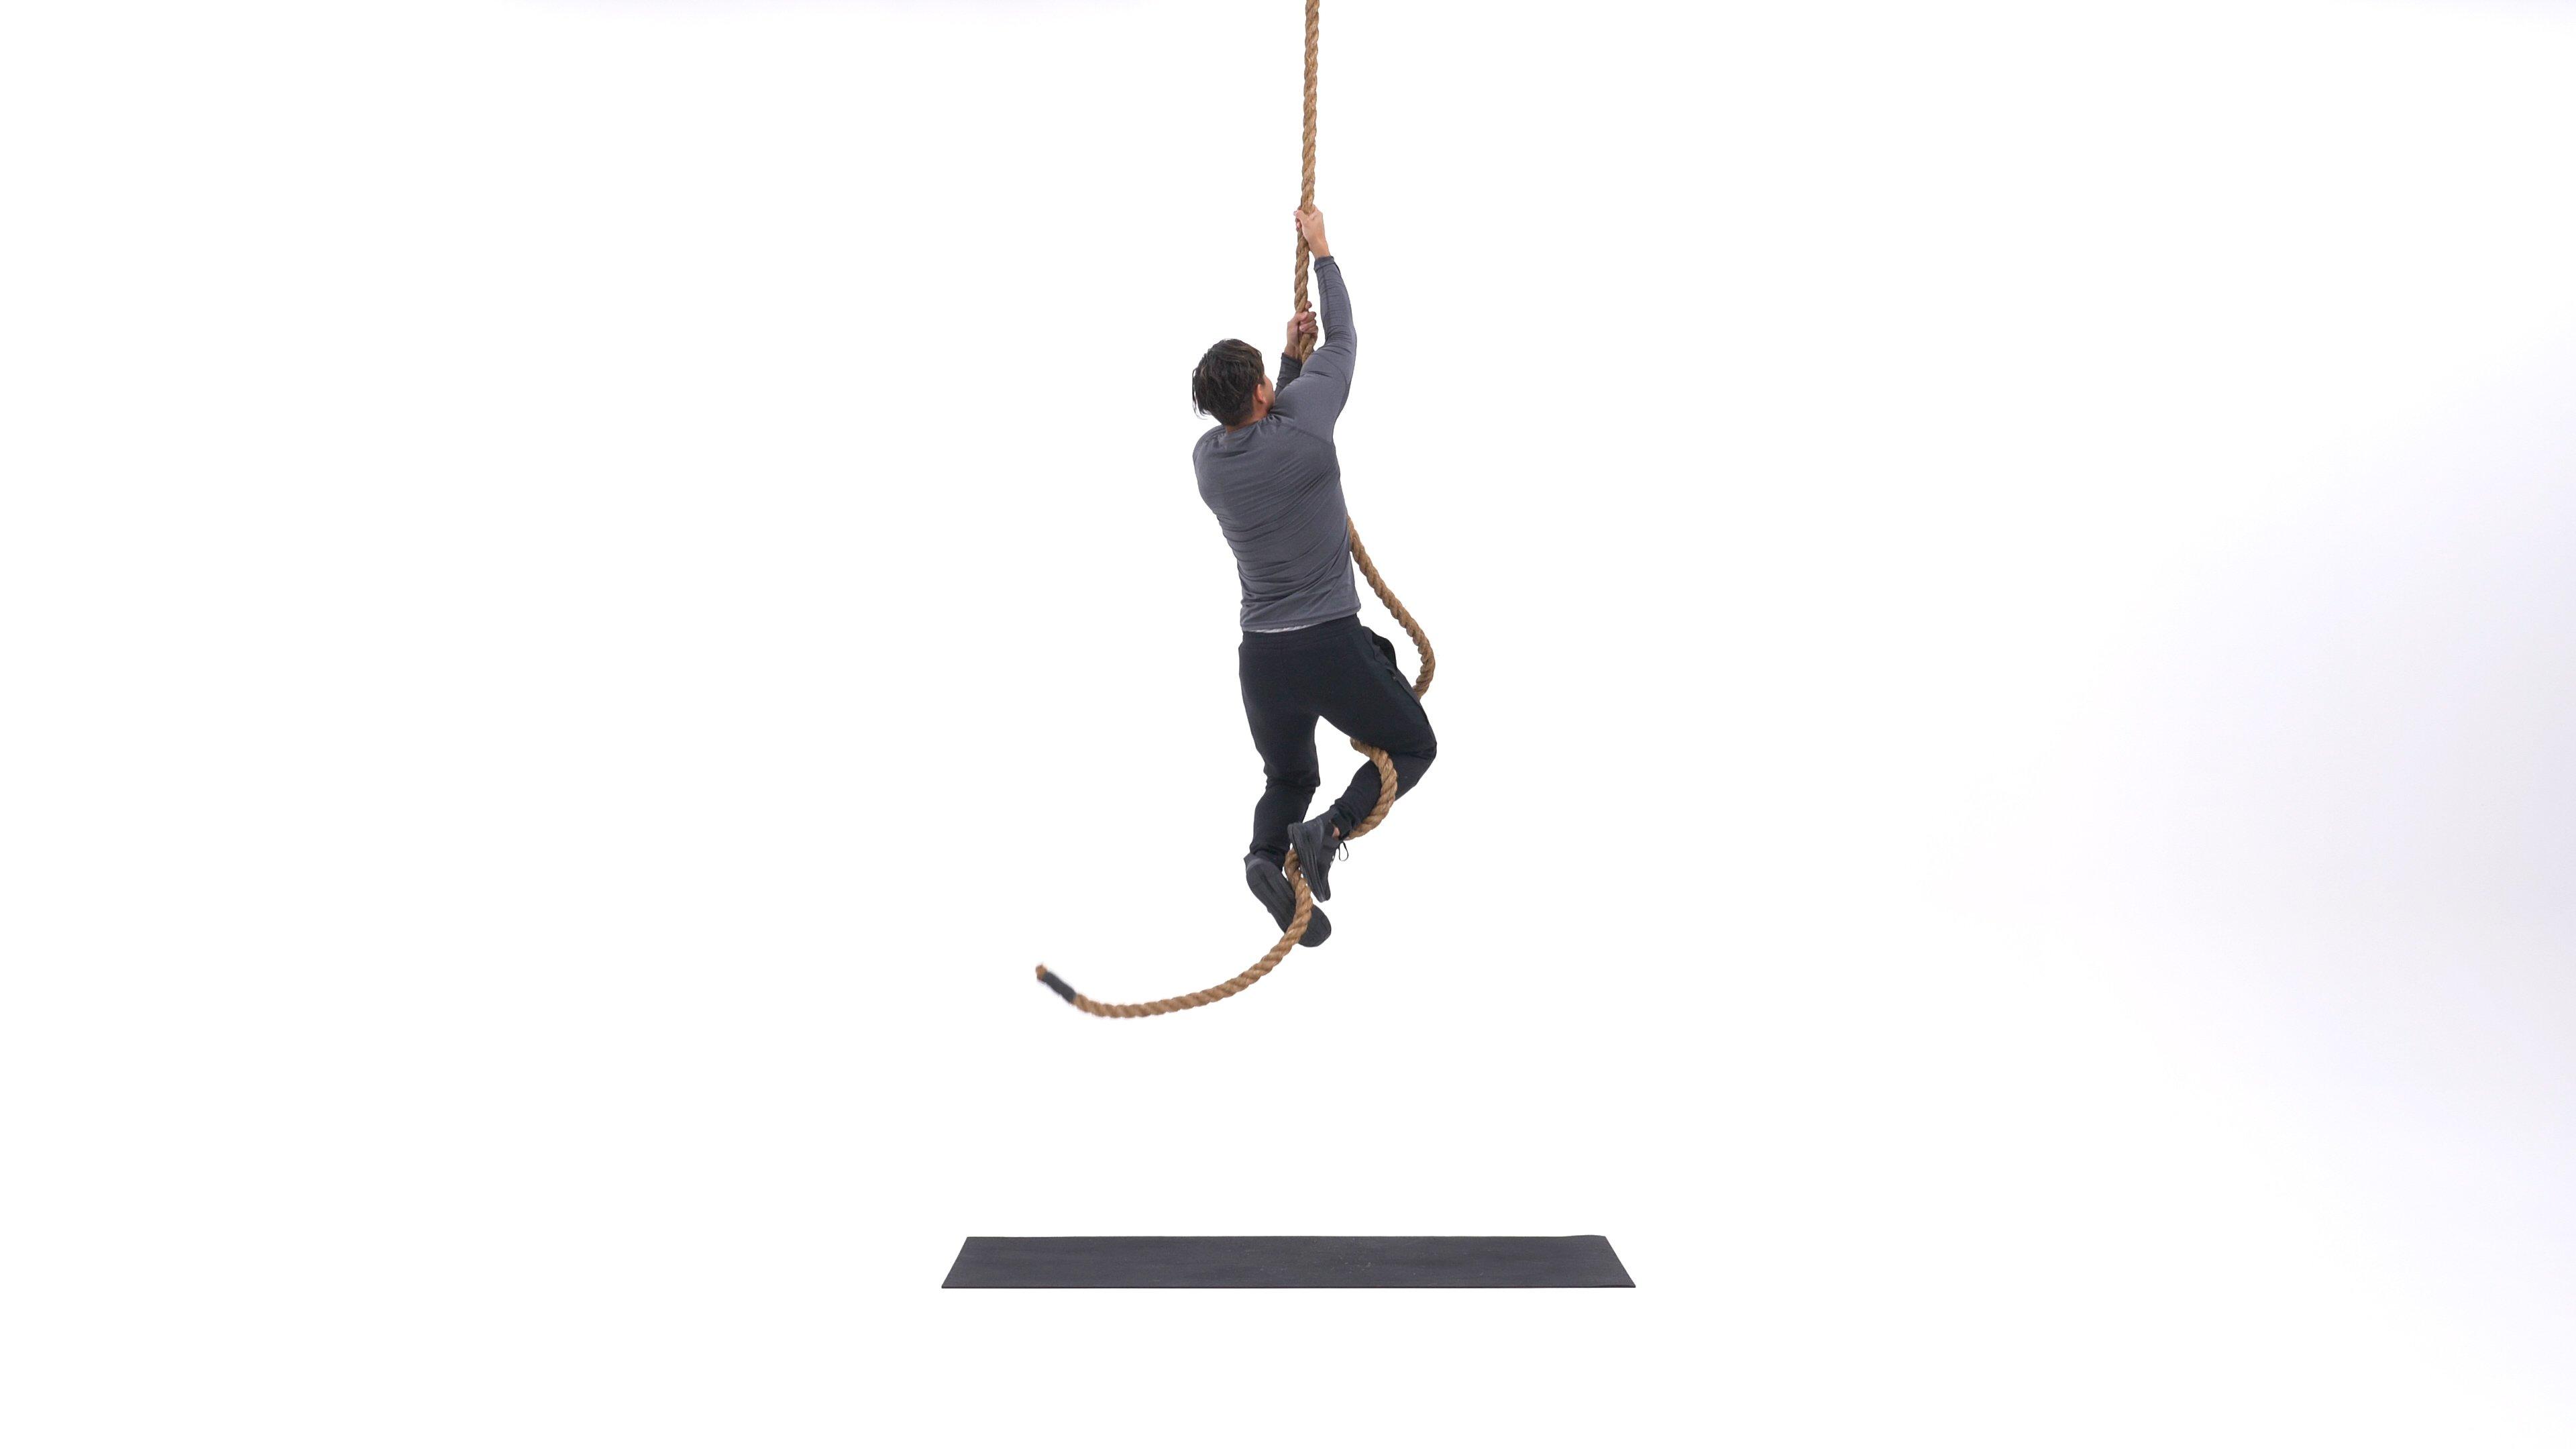 Rope climb image